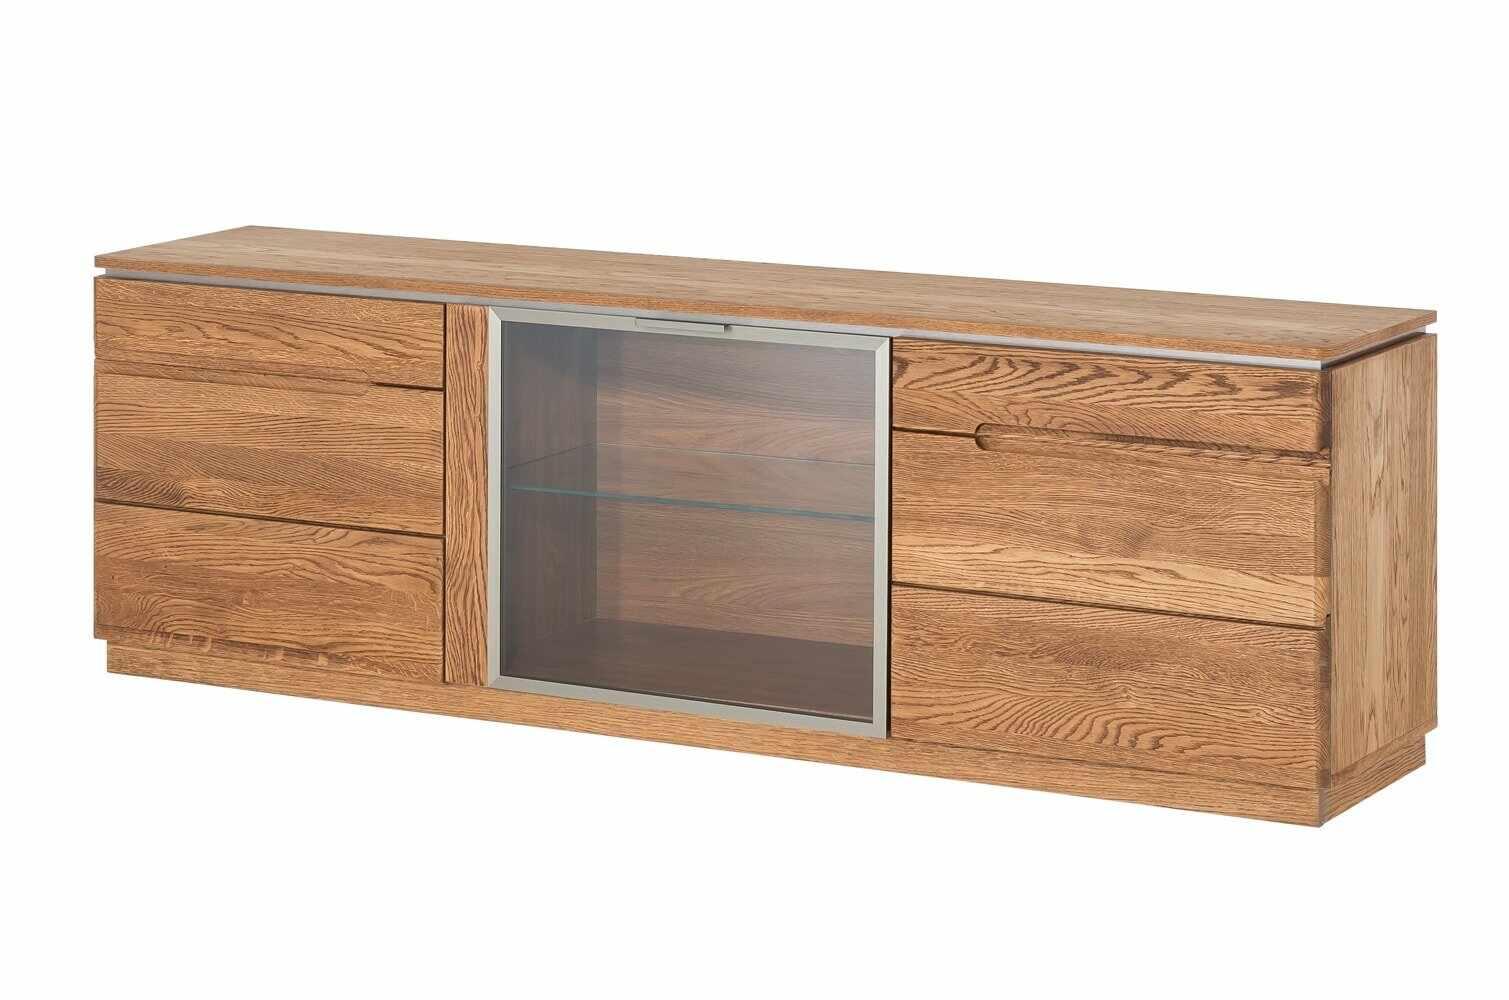 Comoda TV din lemn si furnir, cu 3 usi Montenegro 26 Large Stejar Rustic, l180xA42xH59 cm la pret 2376 lei